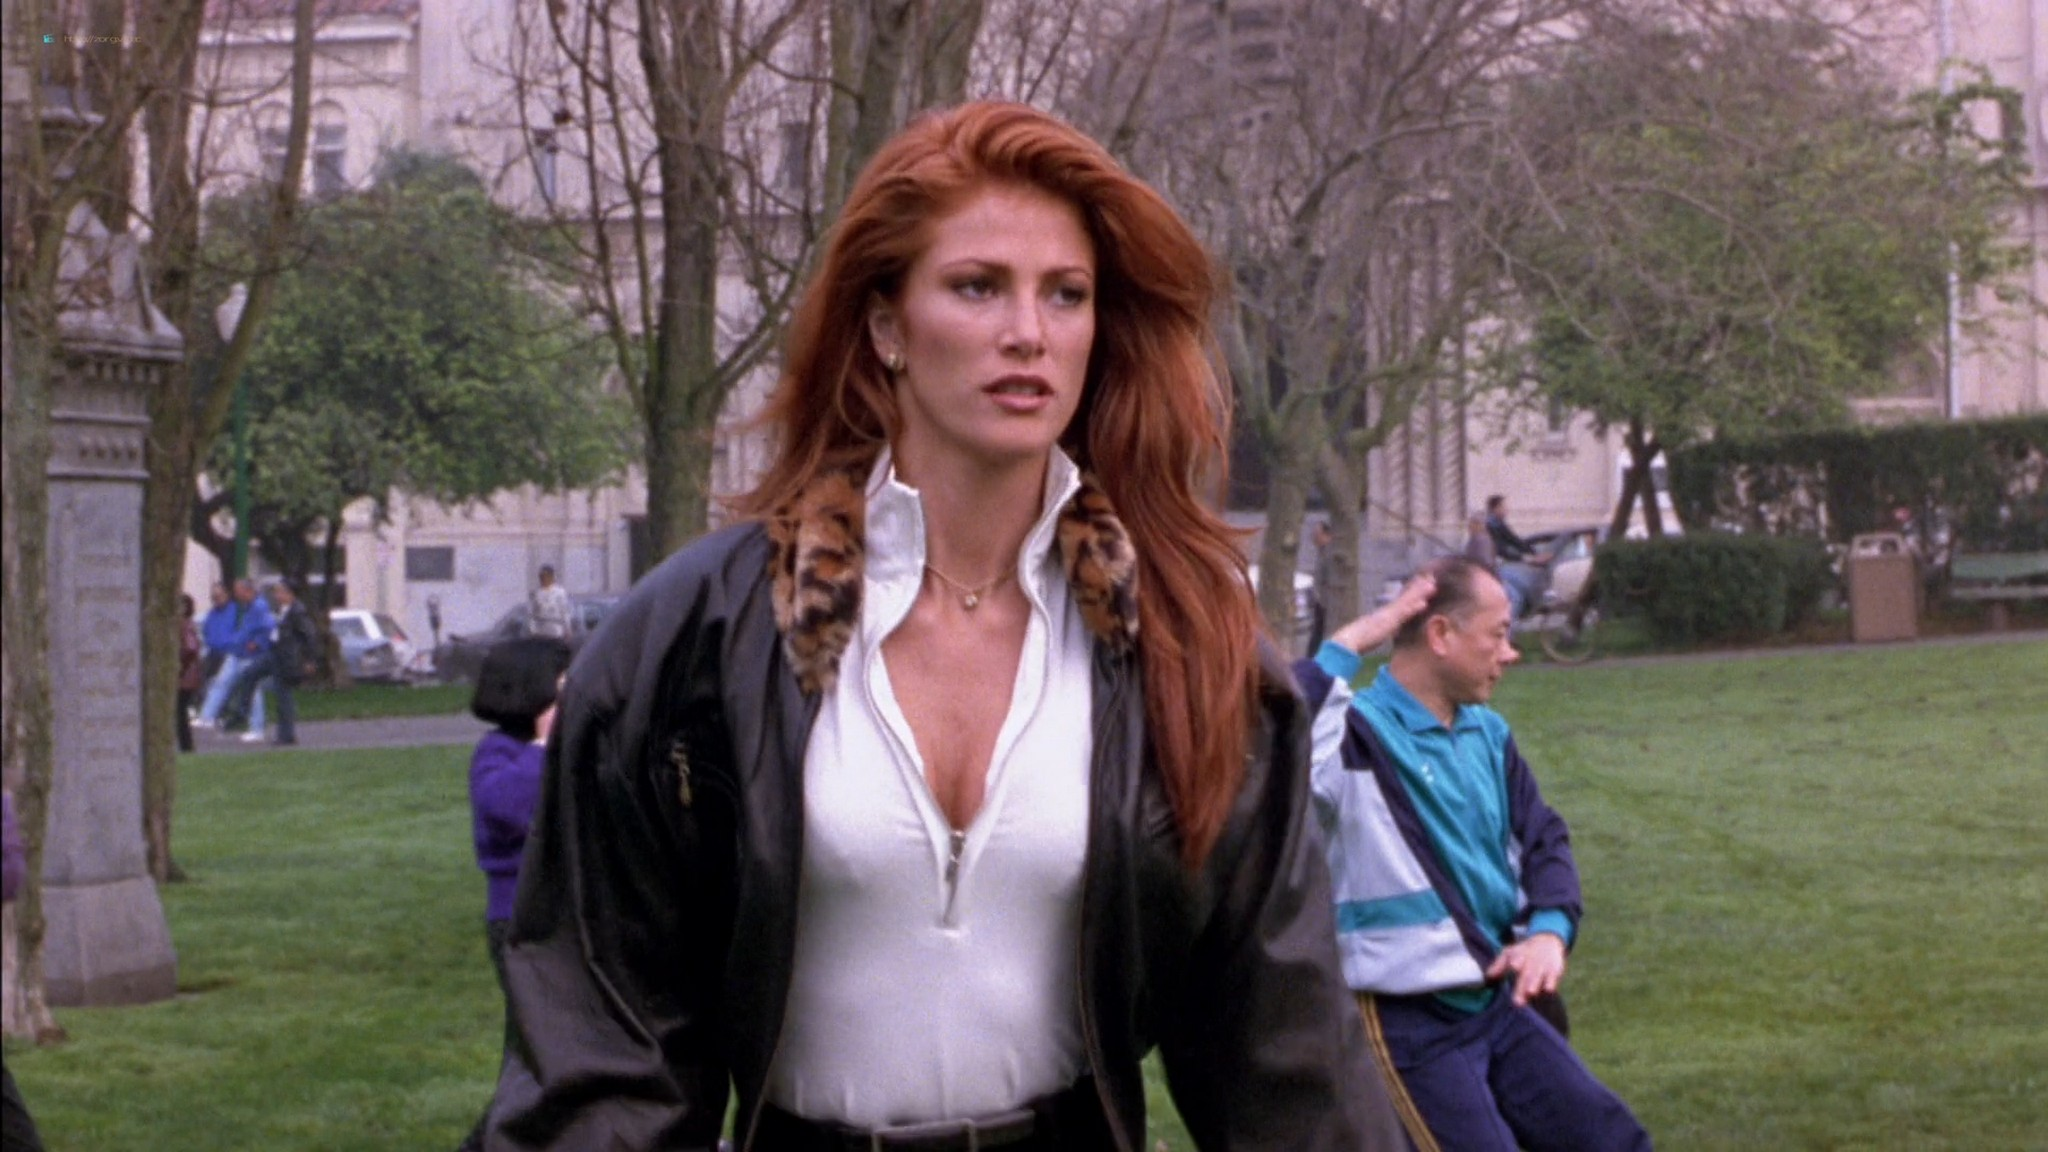 Linda Fiorentino nude Angie Everhart nude full frontal - Jade (1995) HD 1080p BluRay (12)